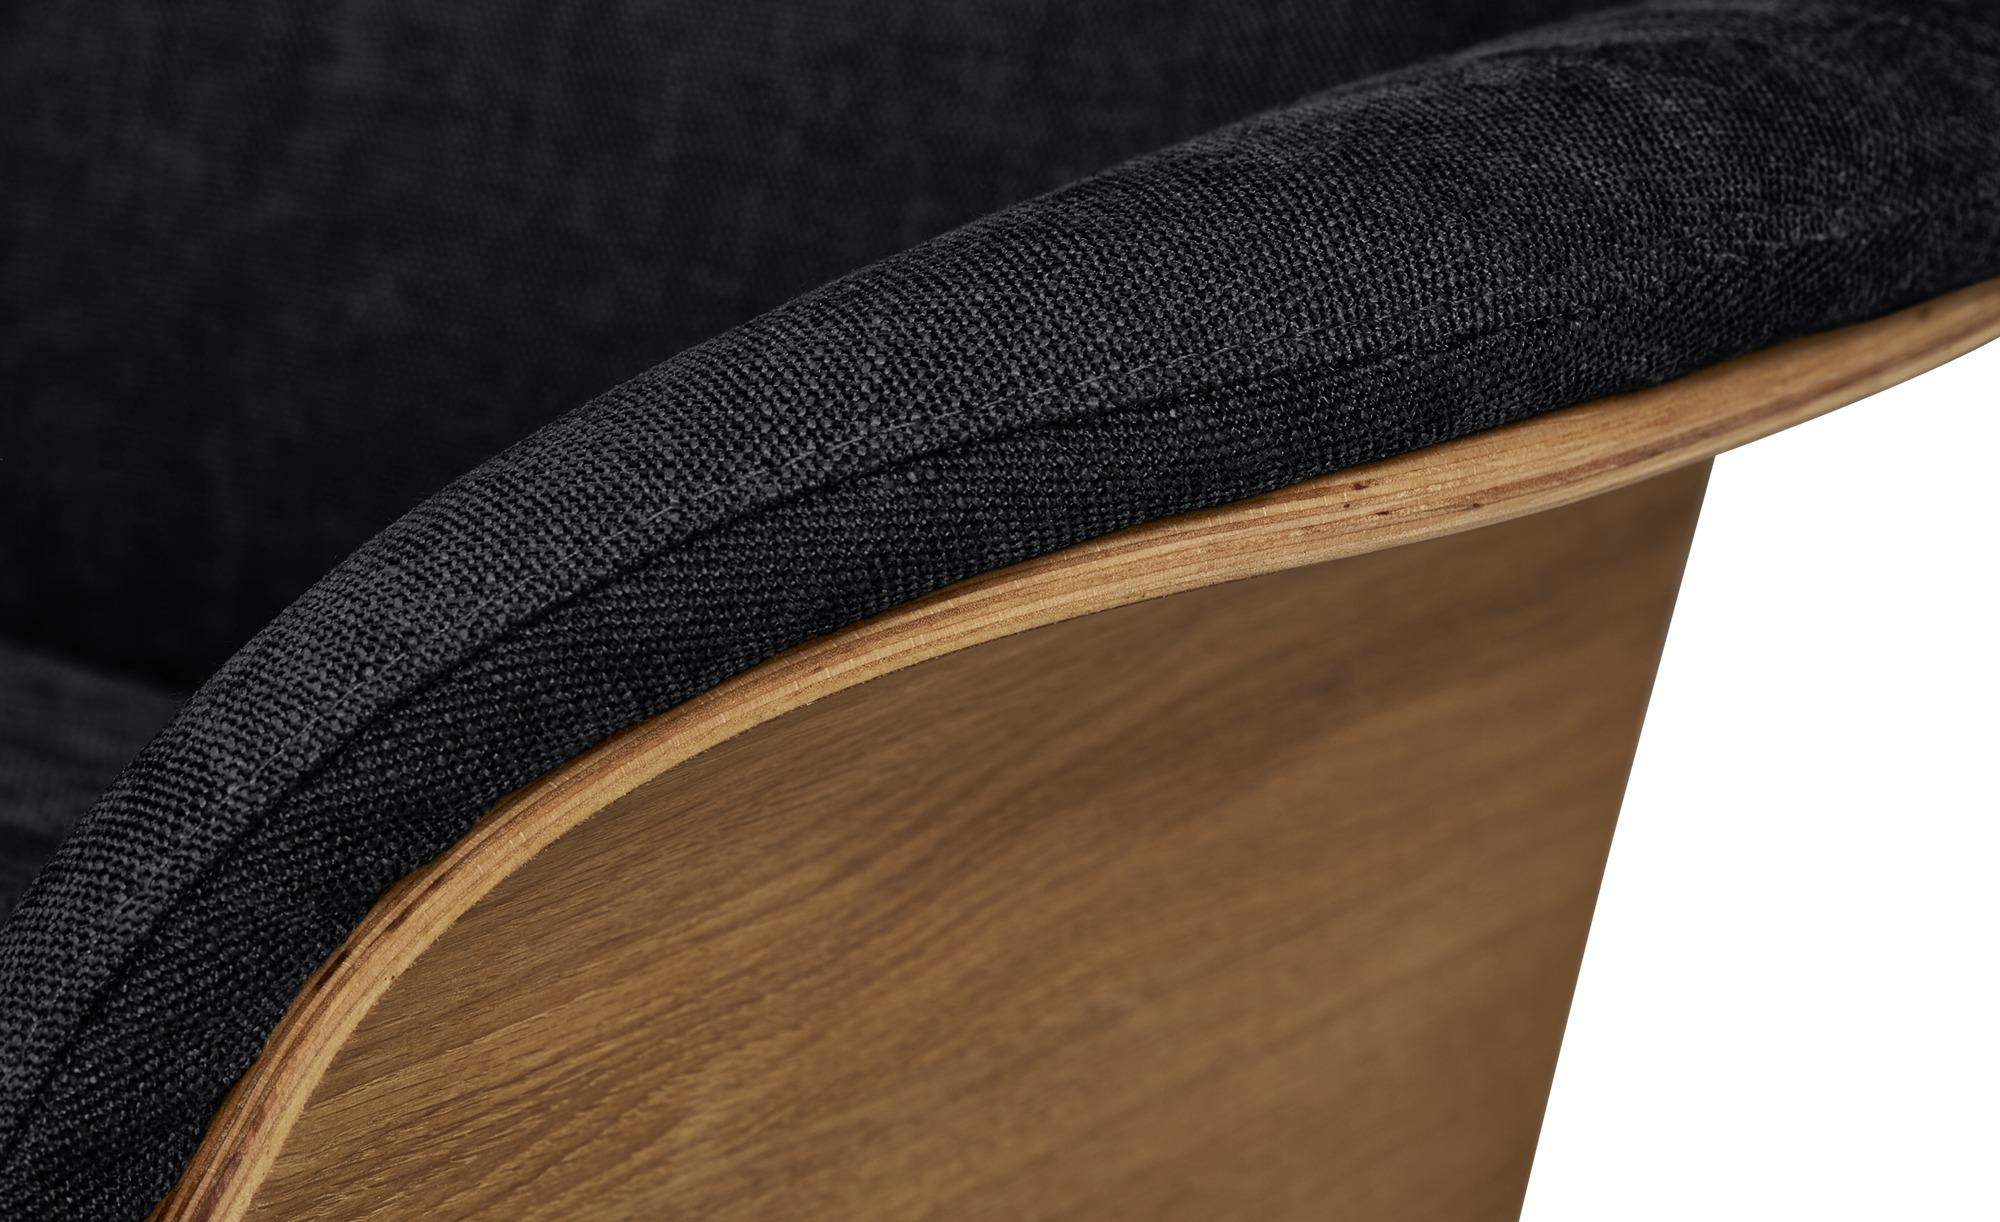 Nils Olsen Relaxsessel  Stian ¦ schwarz ¦ Maße (cm): B: 77 H: 116 T: 82 Polstermöbel > Sessel > Fernsehsessel - Höffner